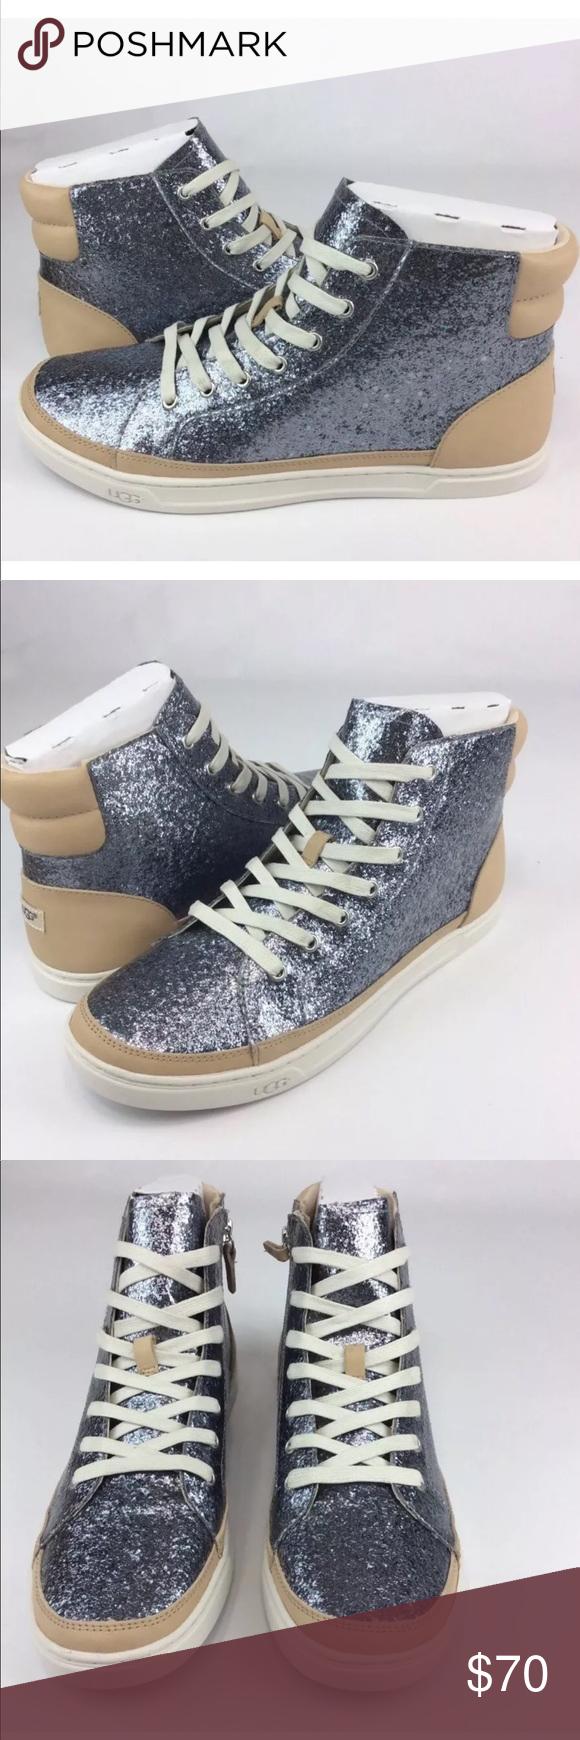 9718b883115 UGG Gradie Glitter Womens Fashion High Top Sneaker UGG Gradie ...